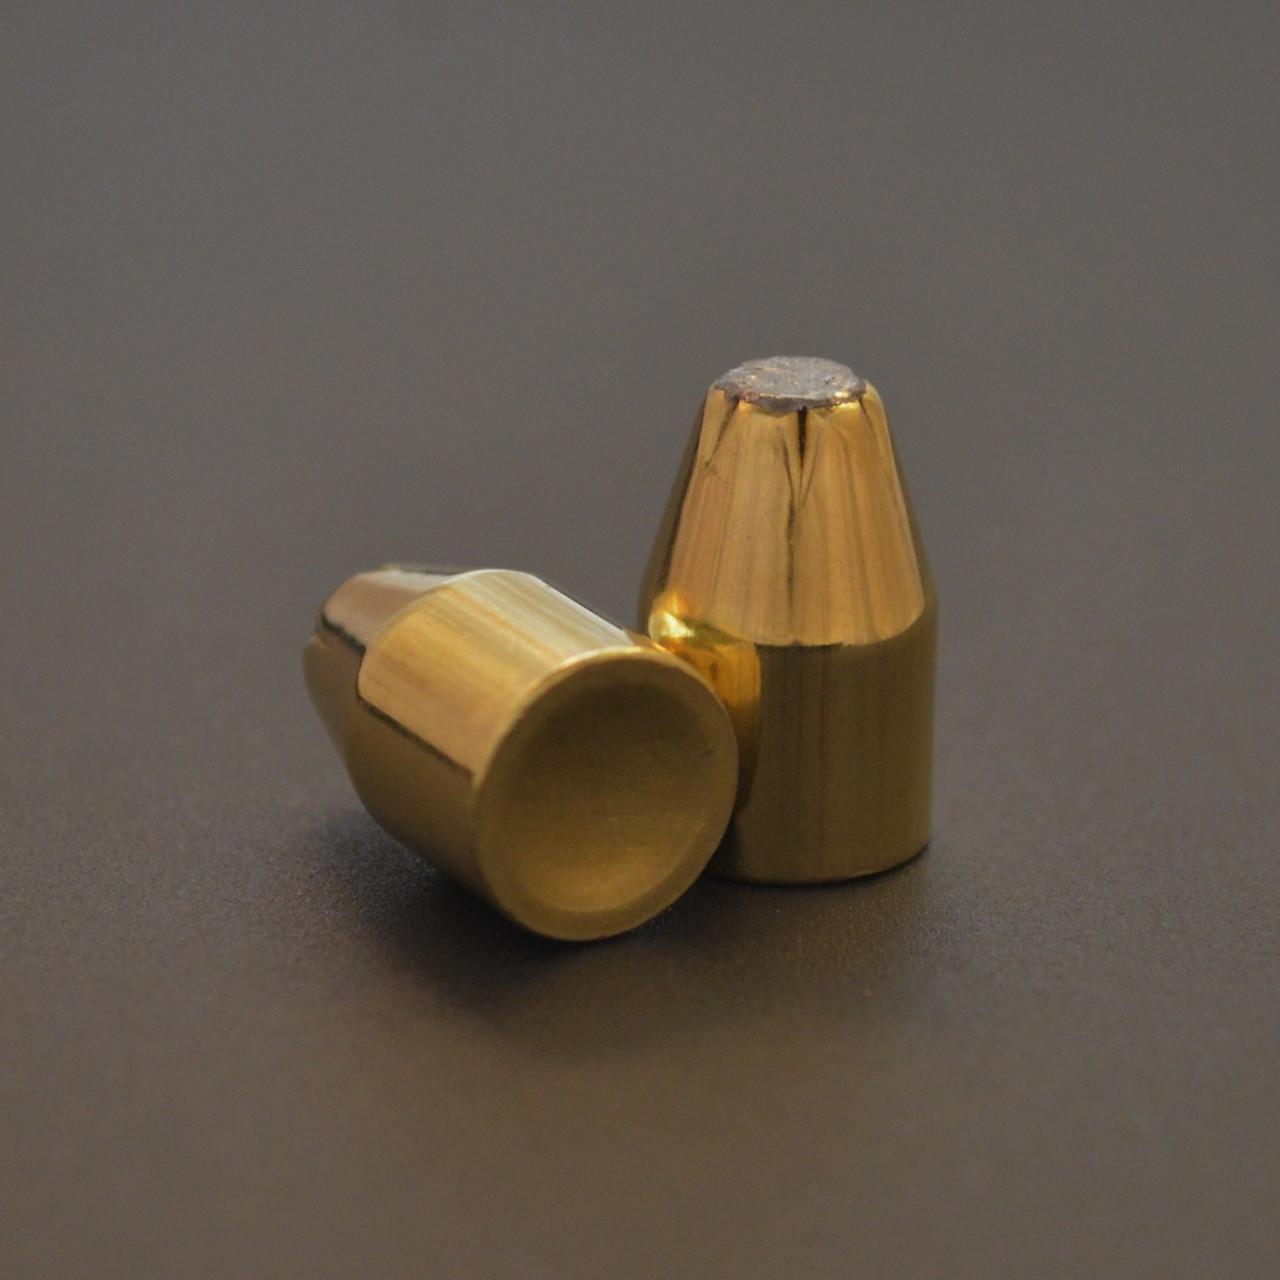 9mm/121gr IFP - 500ct